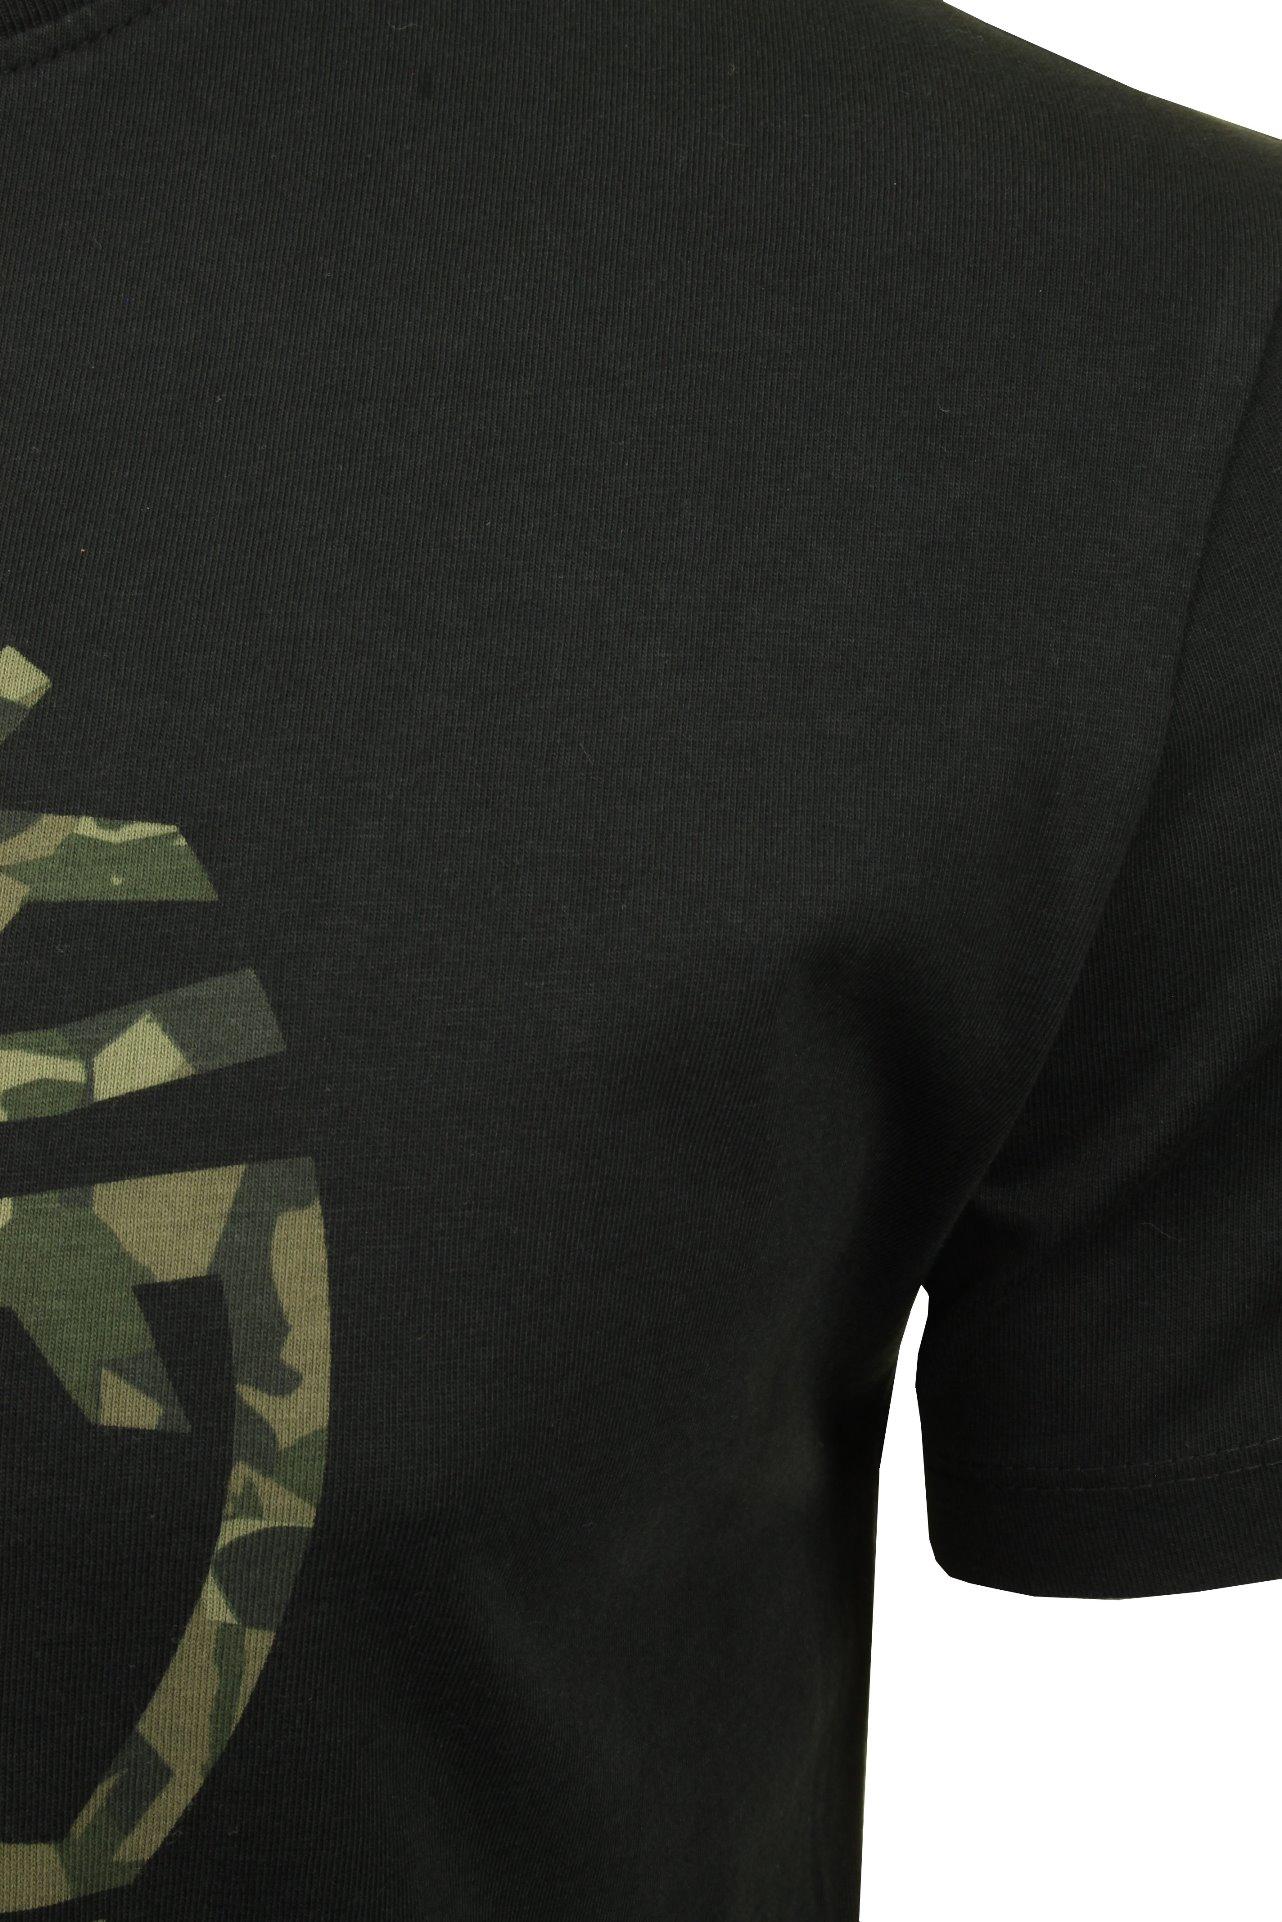 Timberland-Mens-Jersey-T-Shirt-039-Kennebec-Tree-Tee-039-Short-Sleeved thumbnail 4